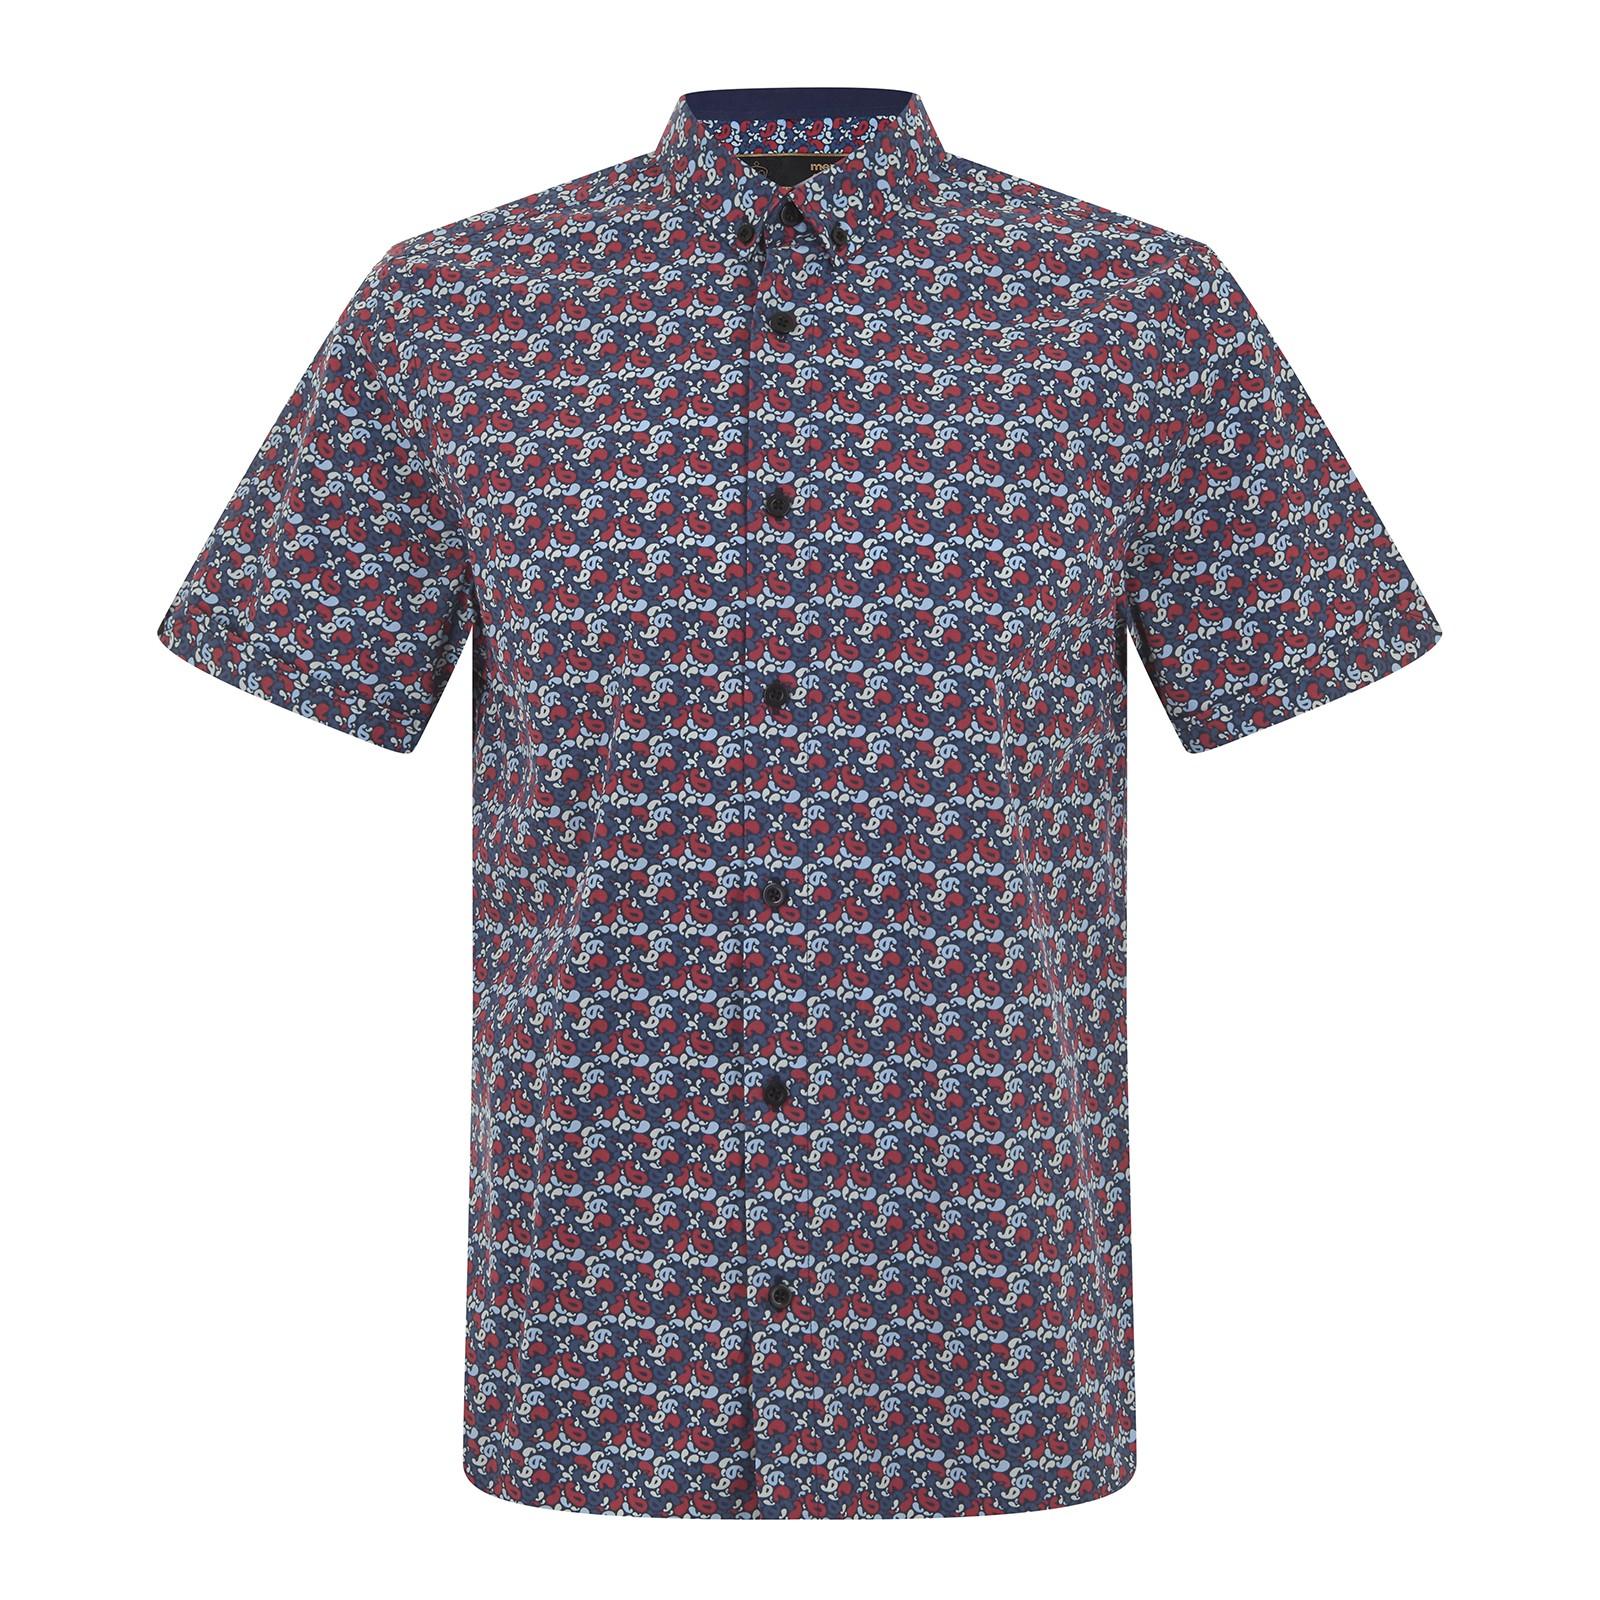 Koszula MERC LONDON TROWER PAISLEY SHIRT, niebieska